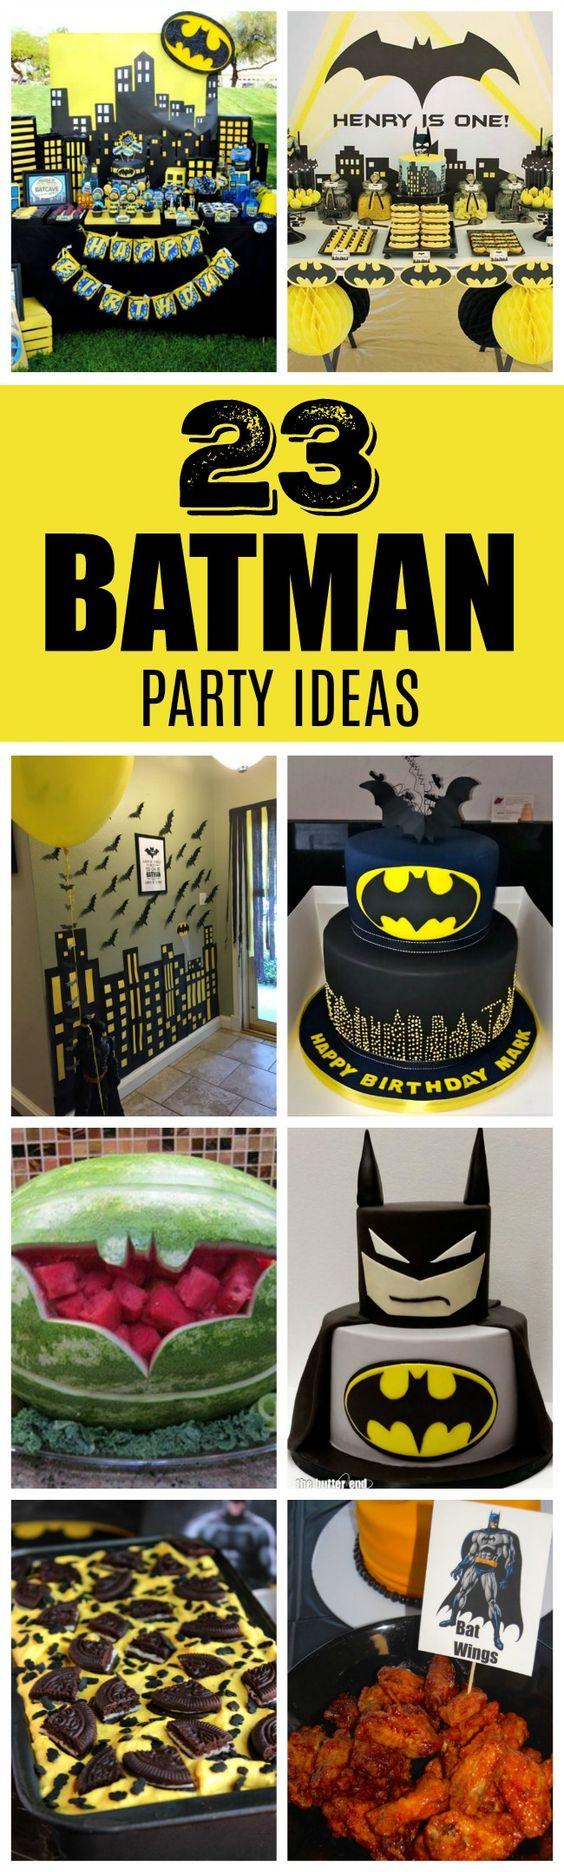 23 Incredible Batman Party Ideas - Pretty My Party